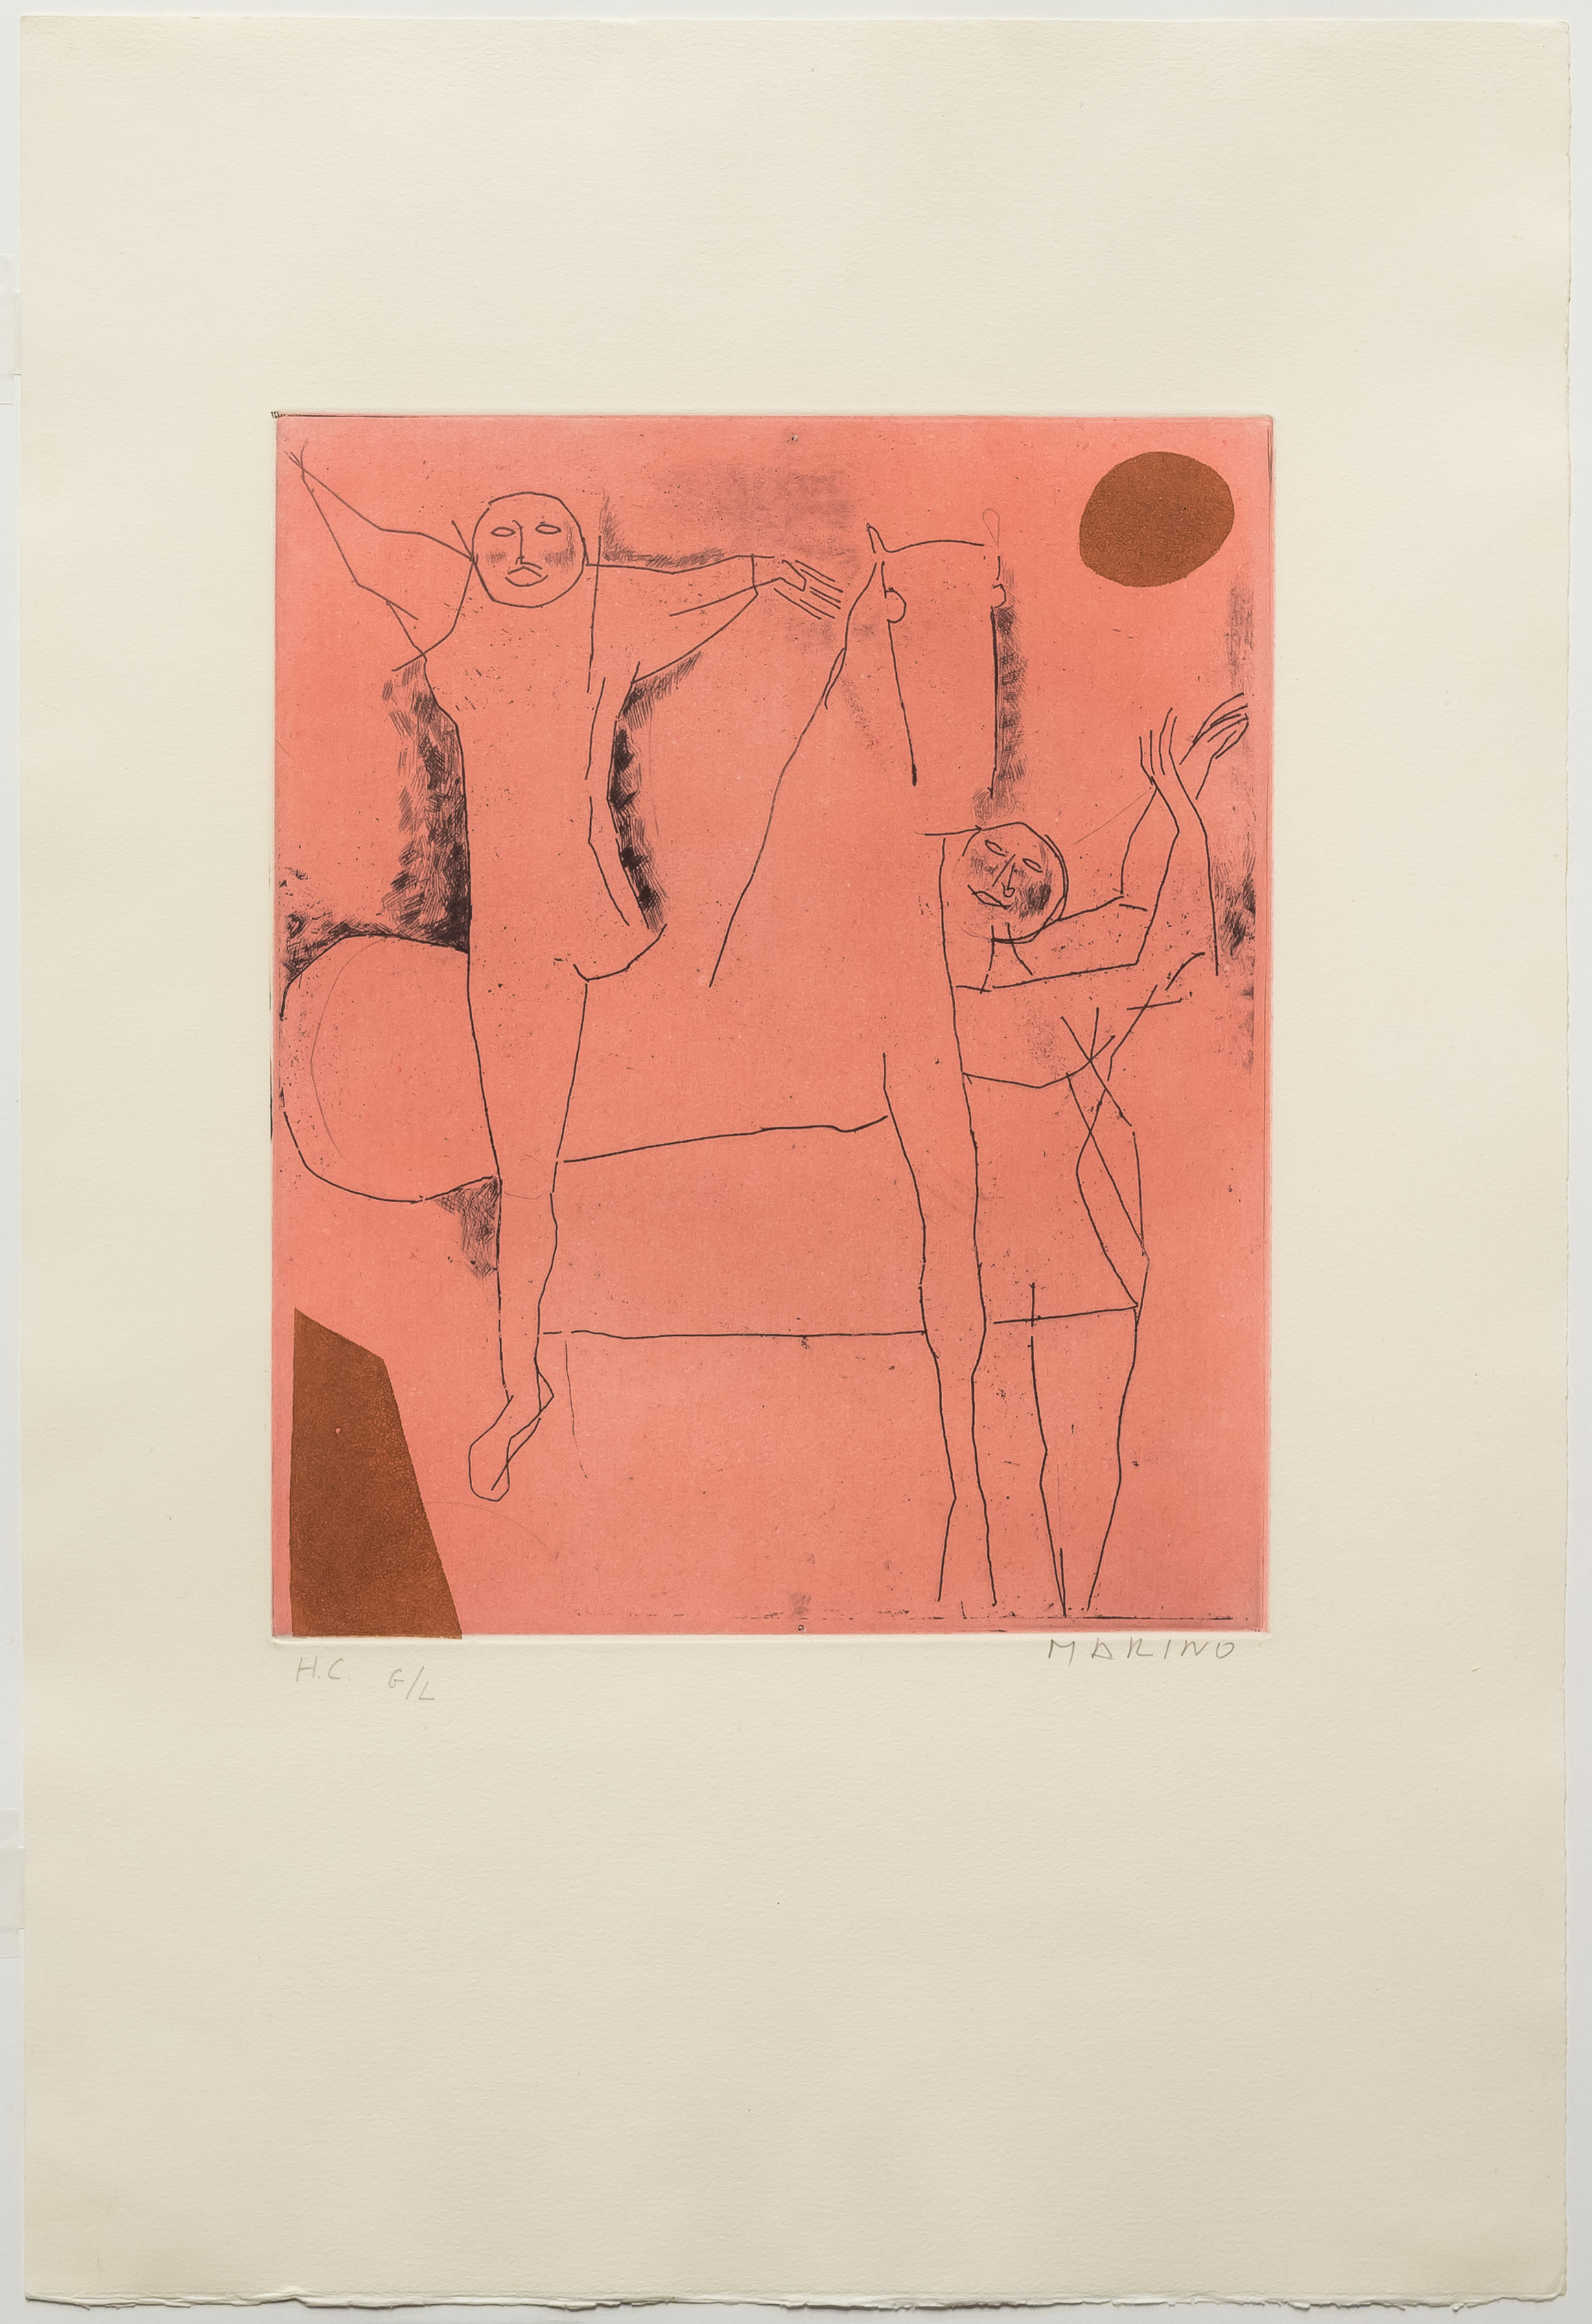 alt Giocoliere, from Tout Pres de Marini, Plate VIII, 1971